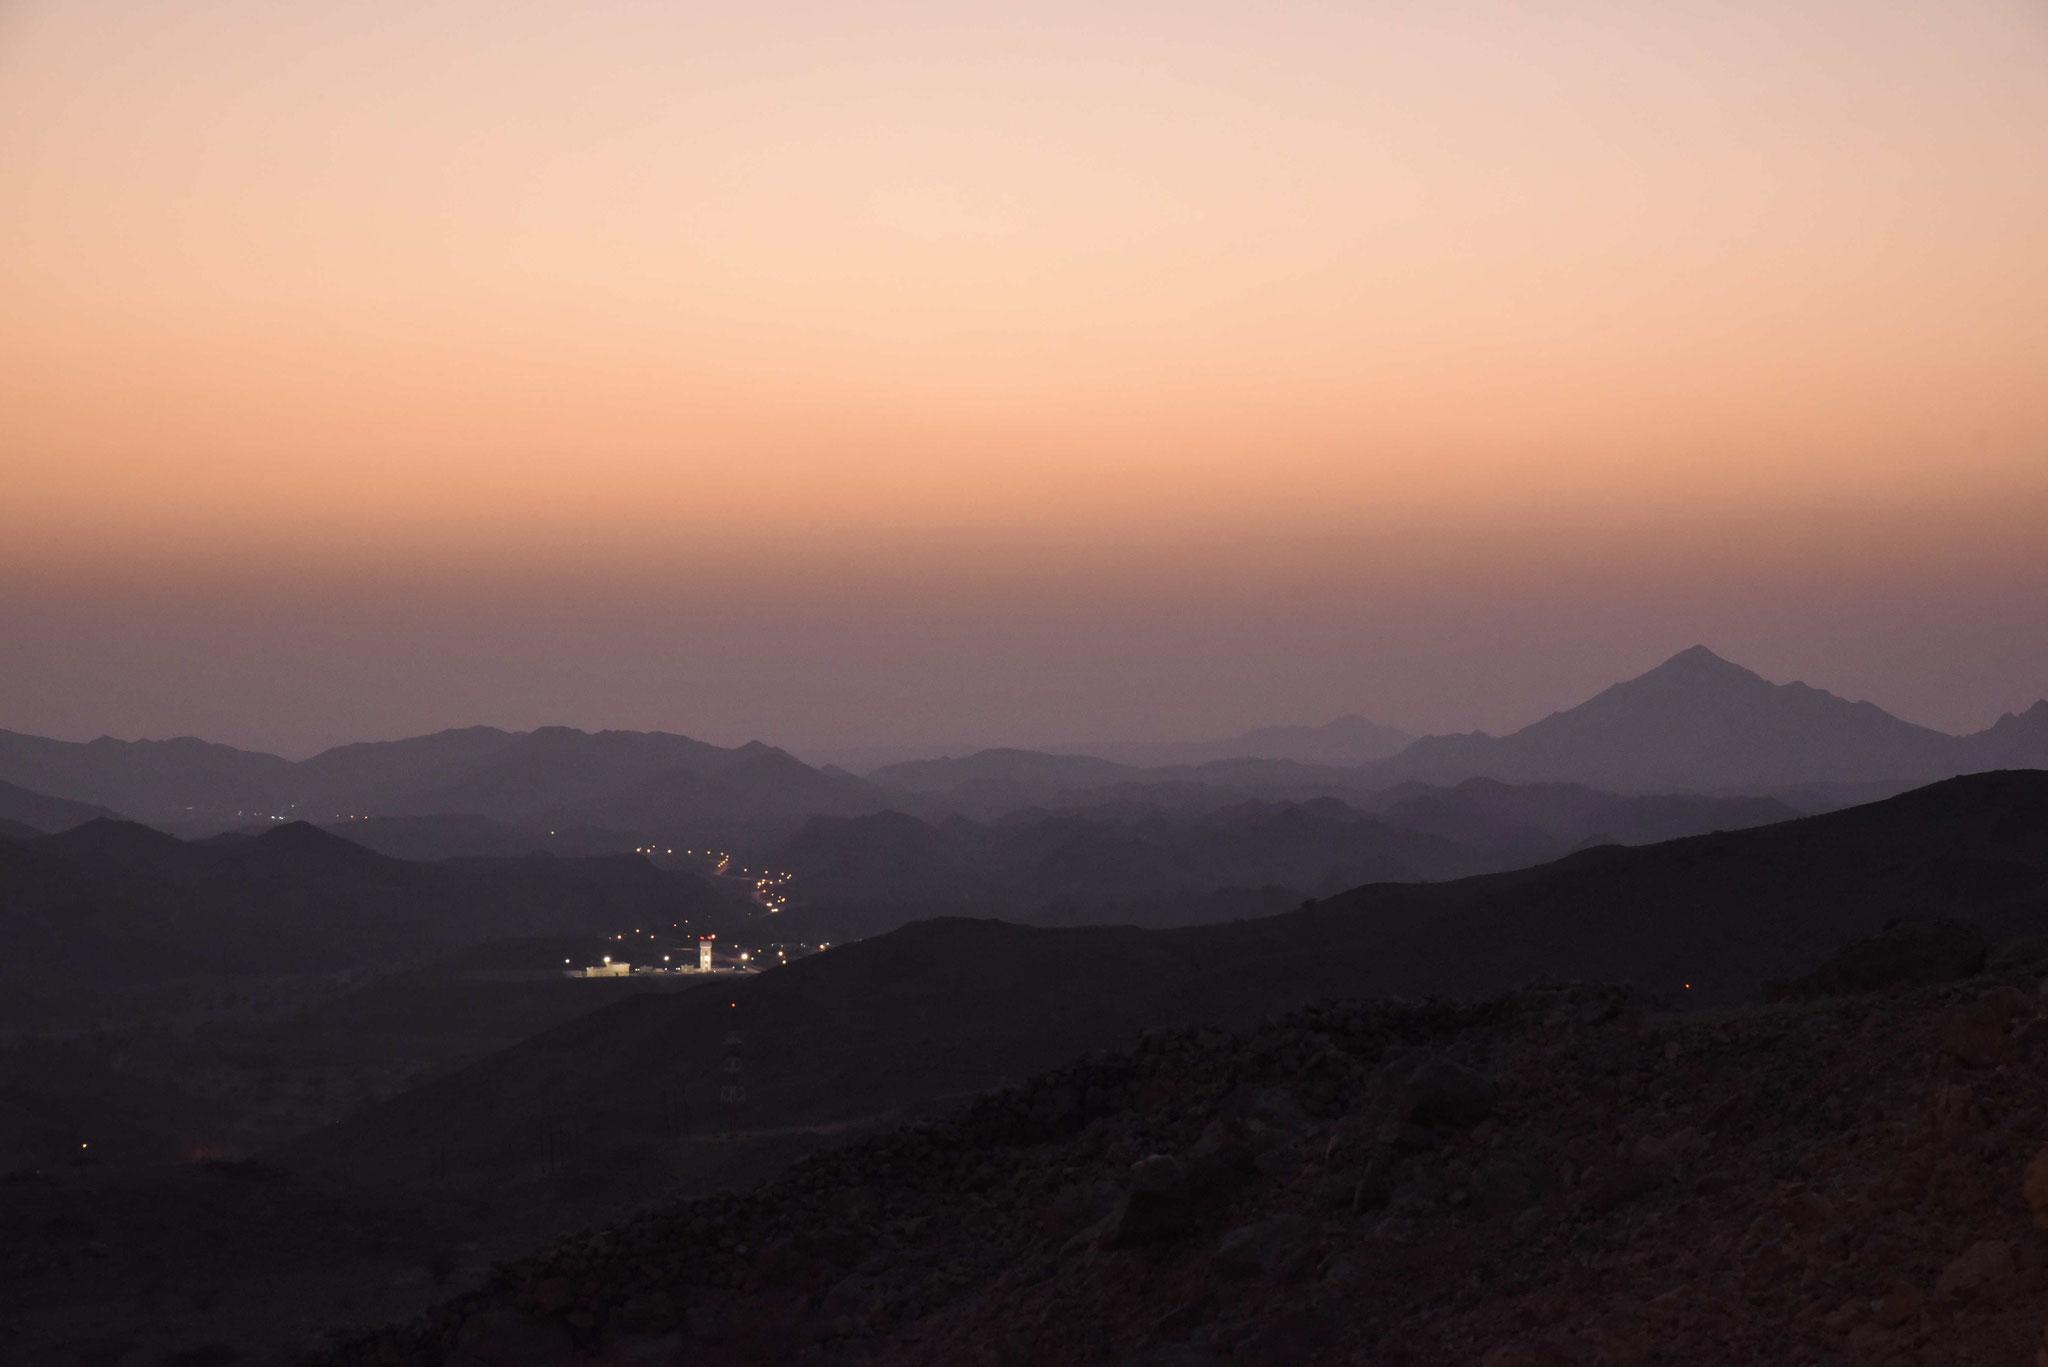 Sonnenuntergang im Hajar-Gebirge